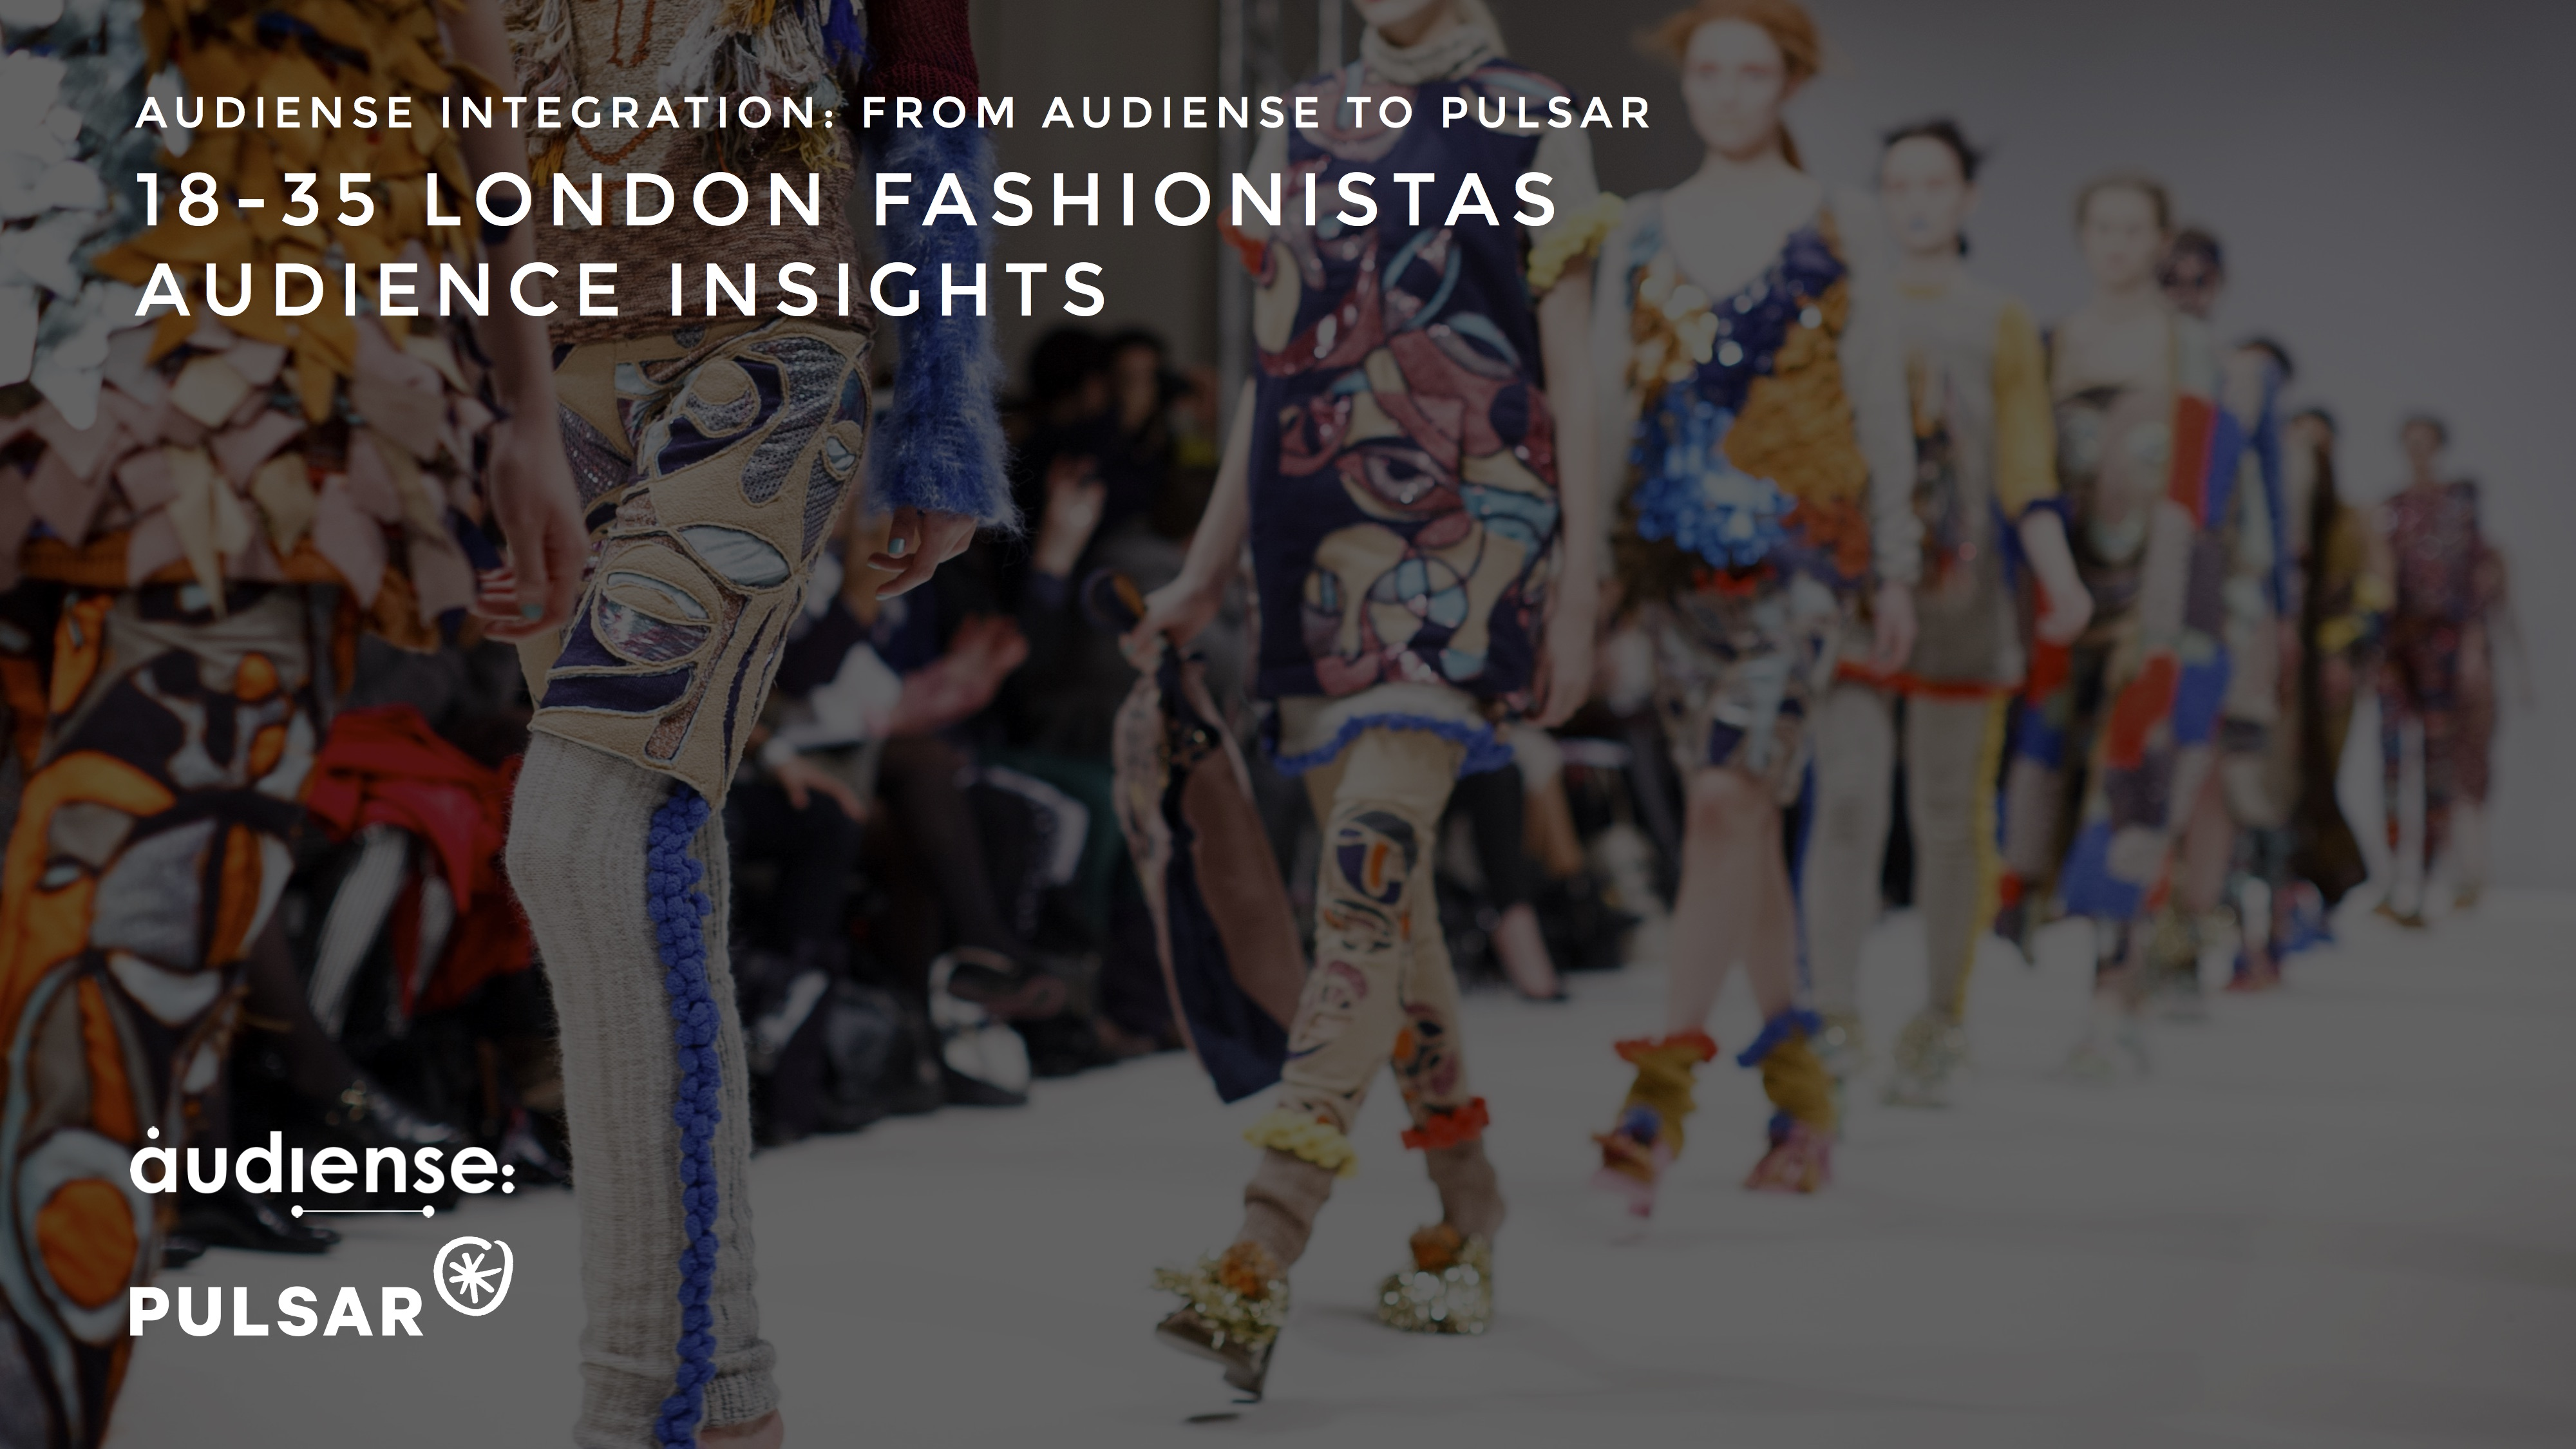 Audiense & Pulsar - 18-35 London Fashionistas Audience Insights